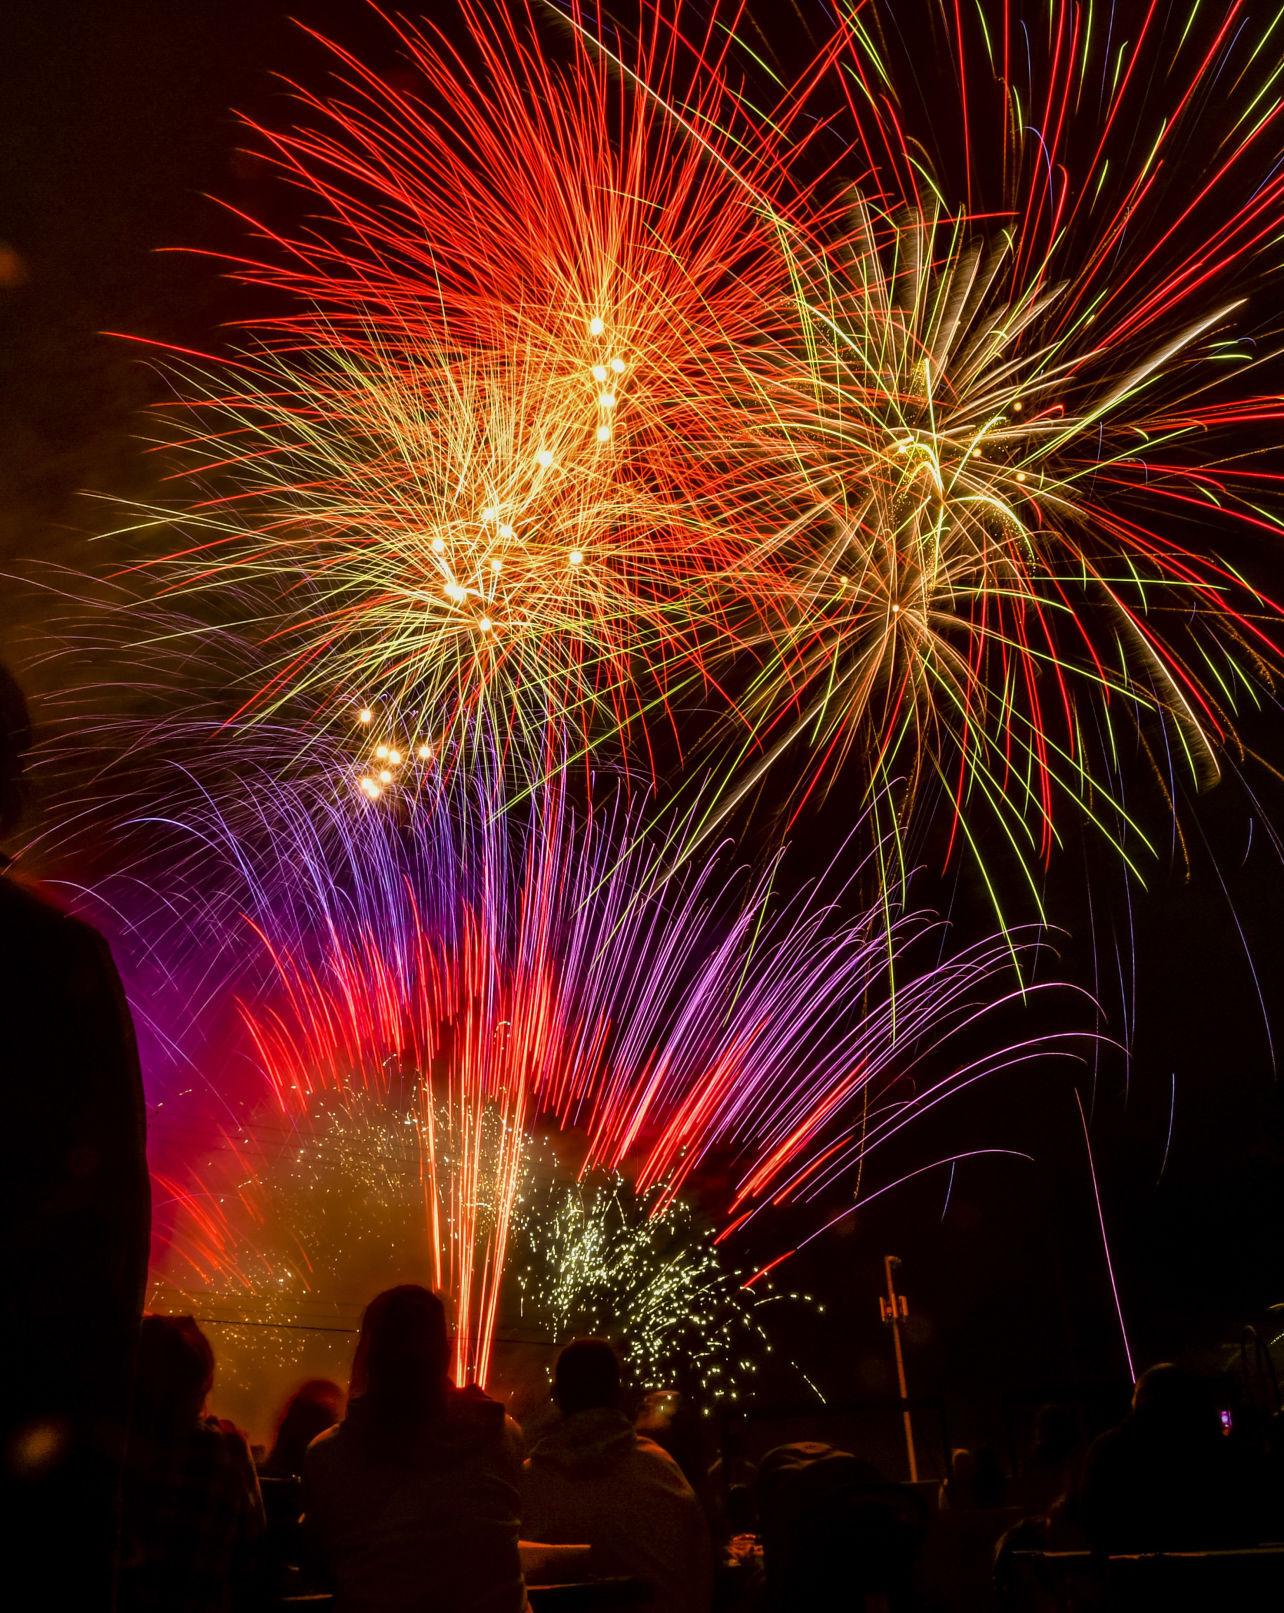 070421 Lompoc fireworks 01.JPG